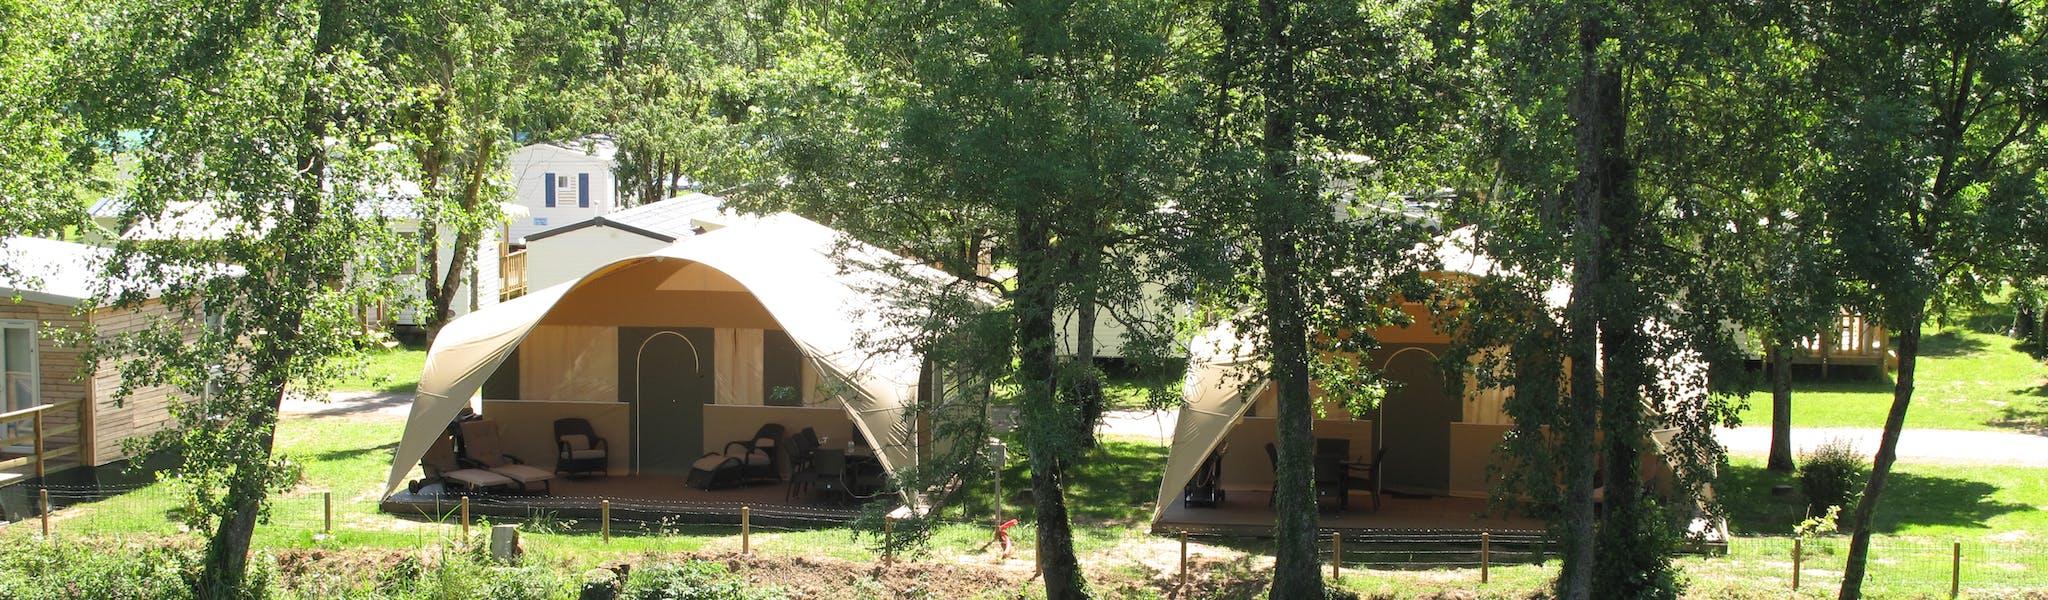 Grand Lodge tent